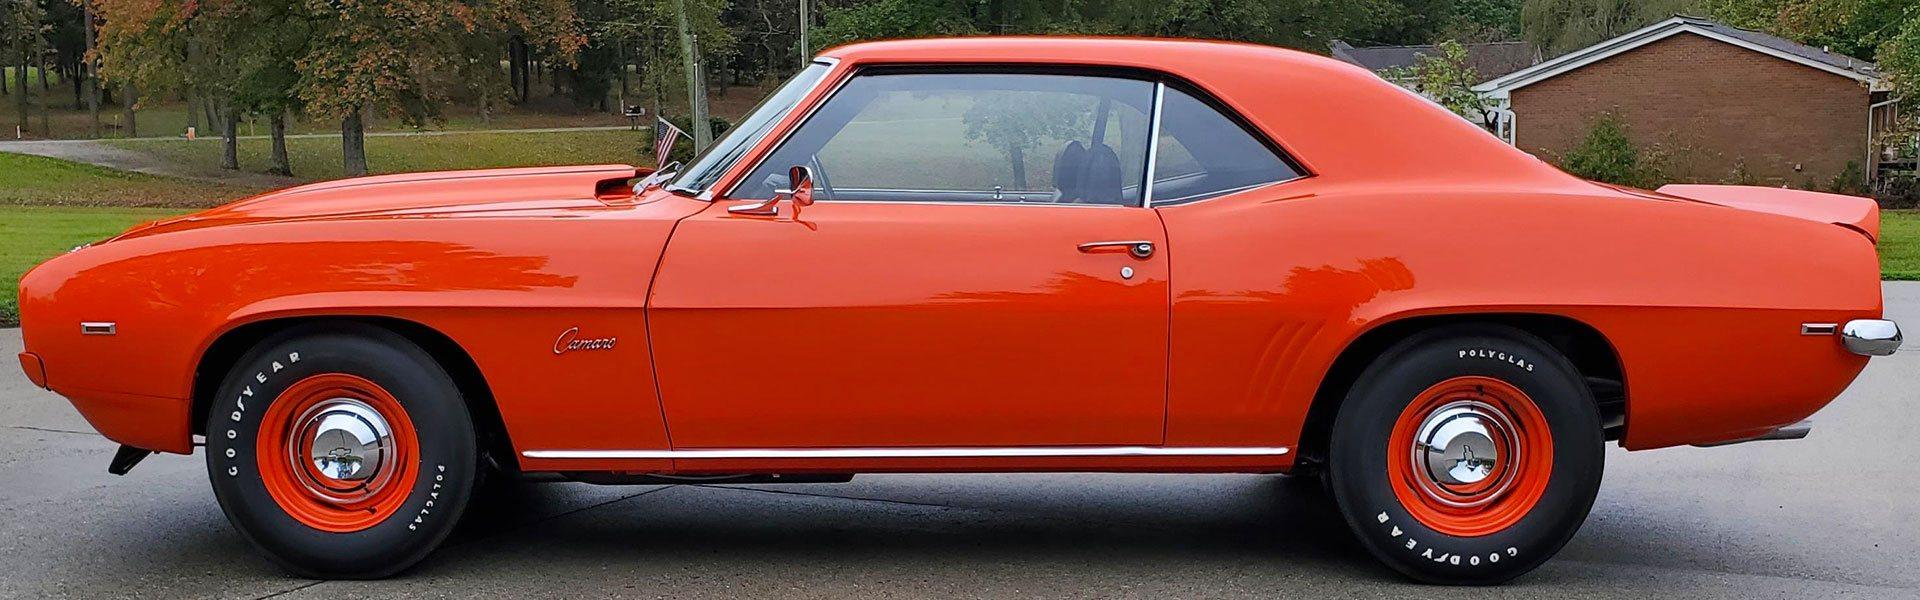 1969 Chevrolet Camaro ZL-1 427